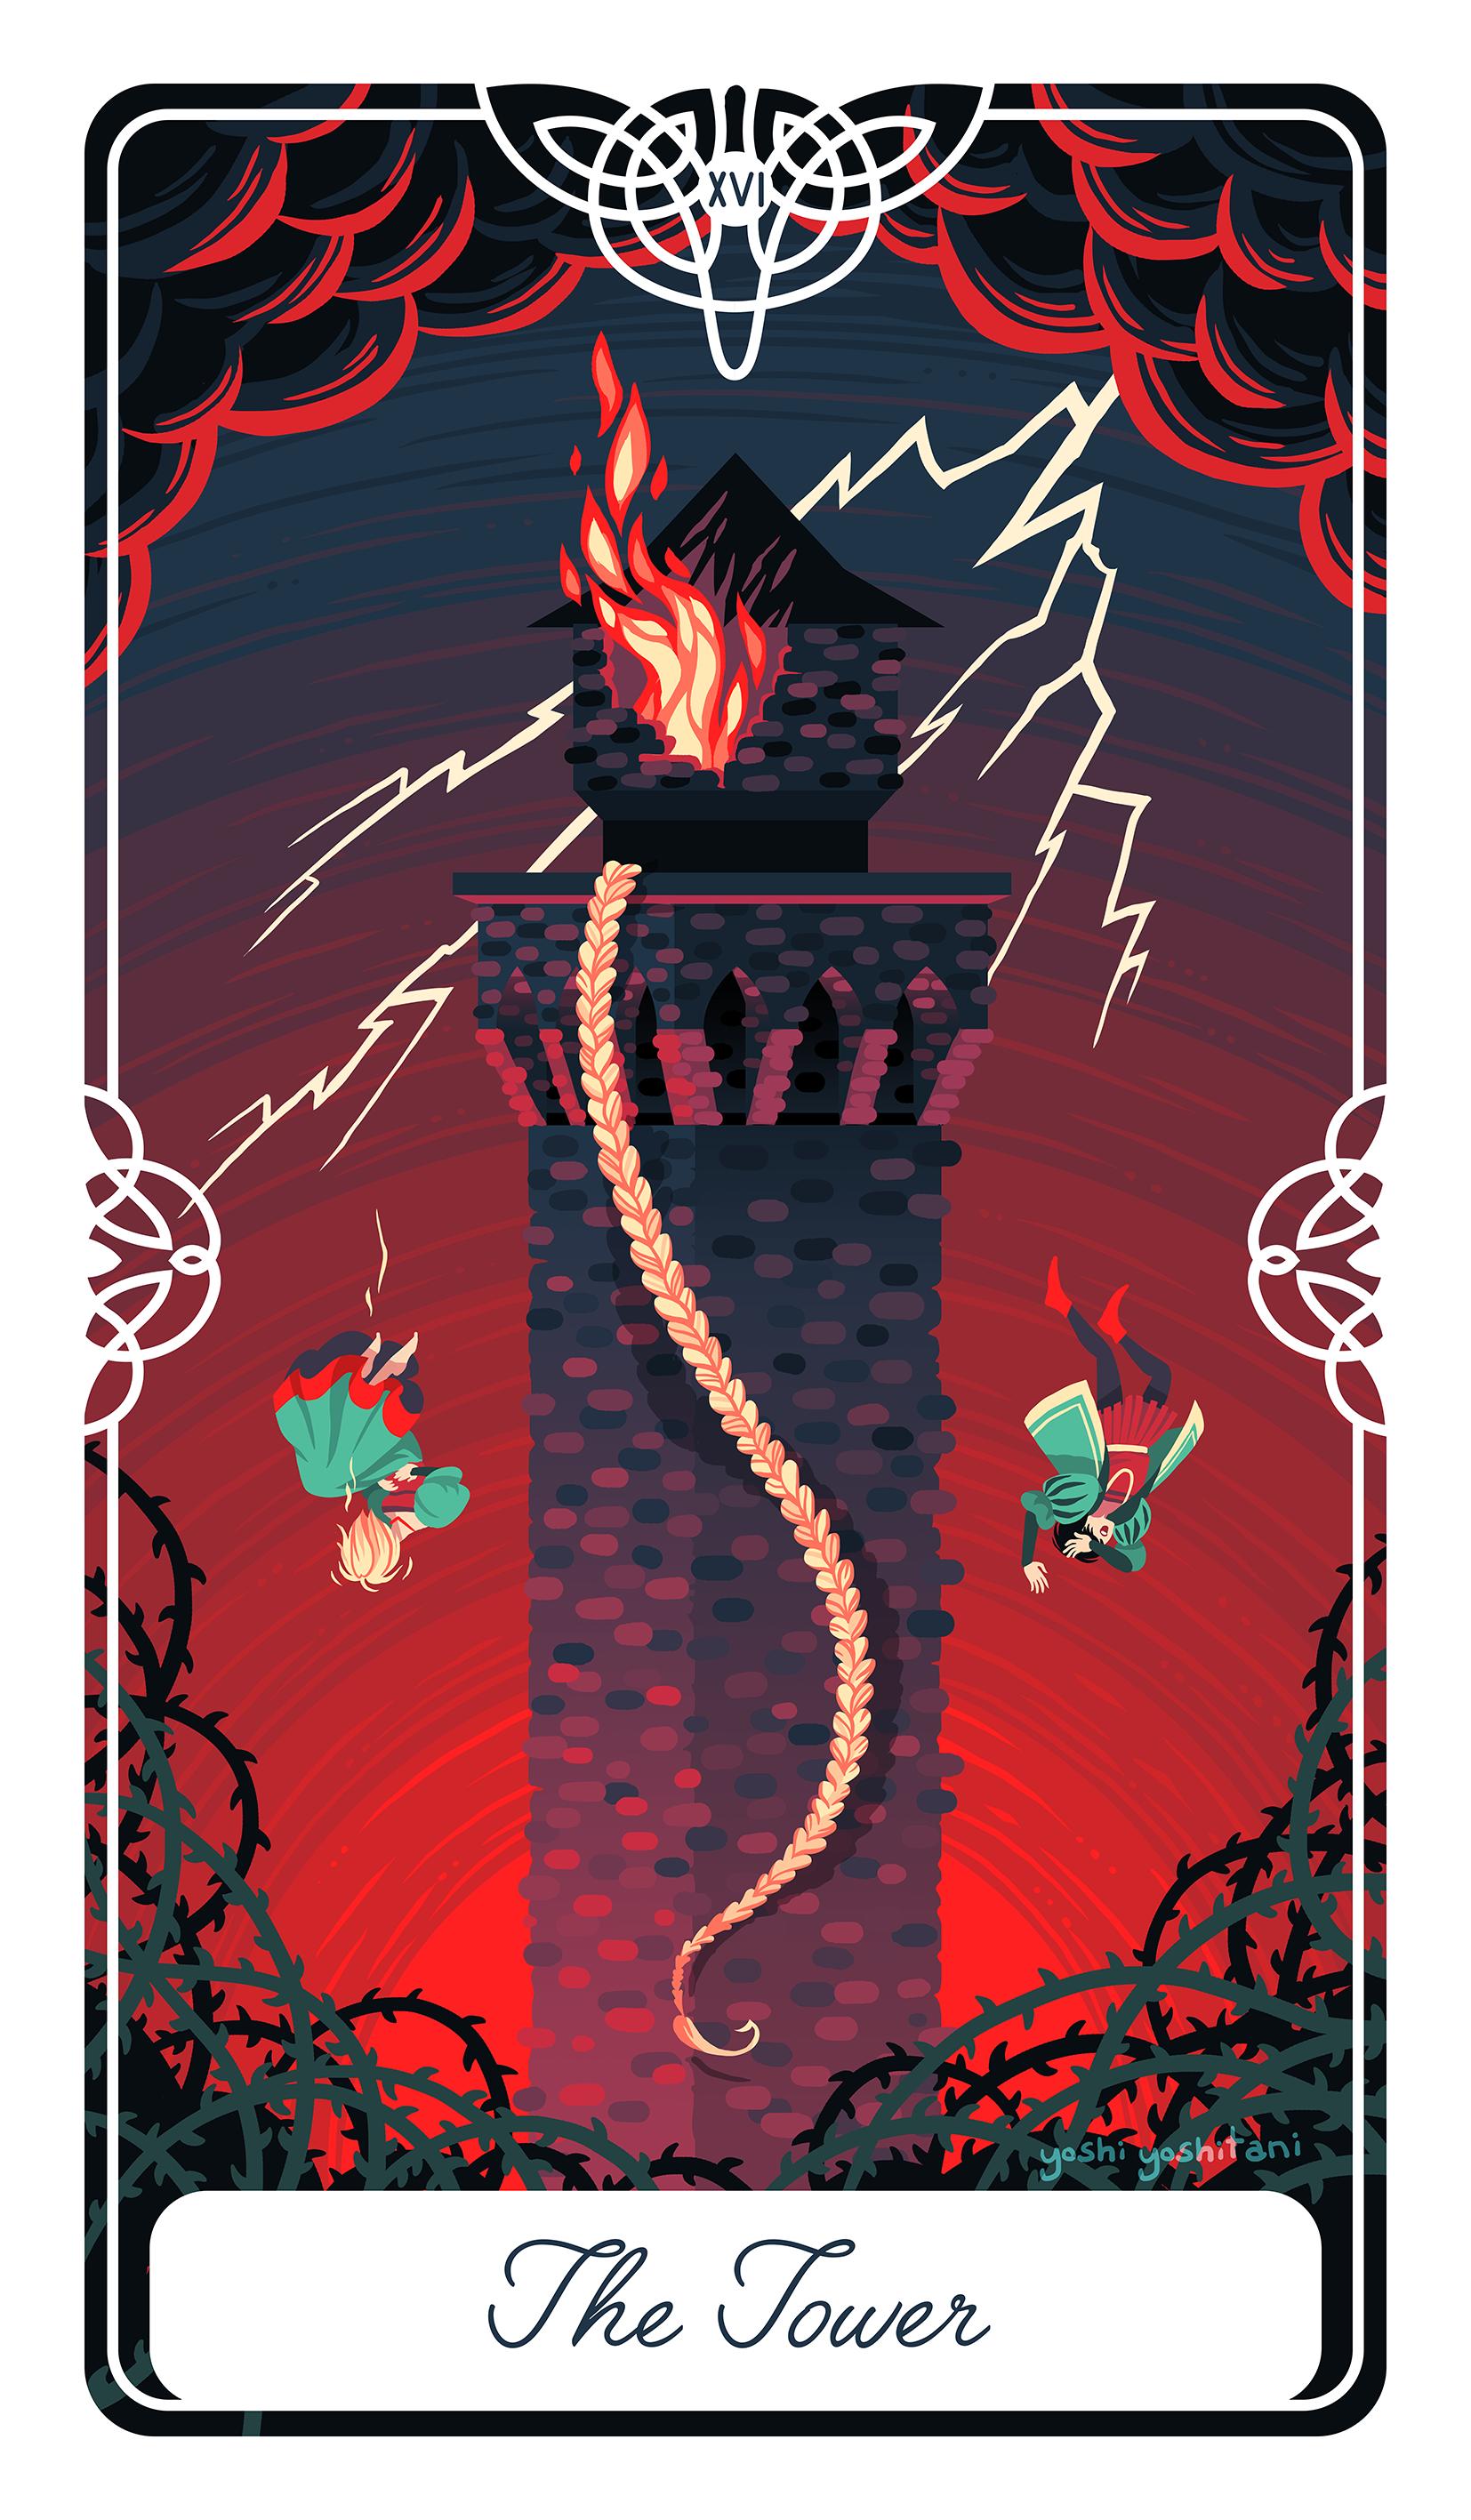 y-nghia-cua-la-bai-tarot-the-tower-7